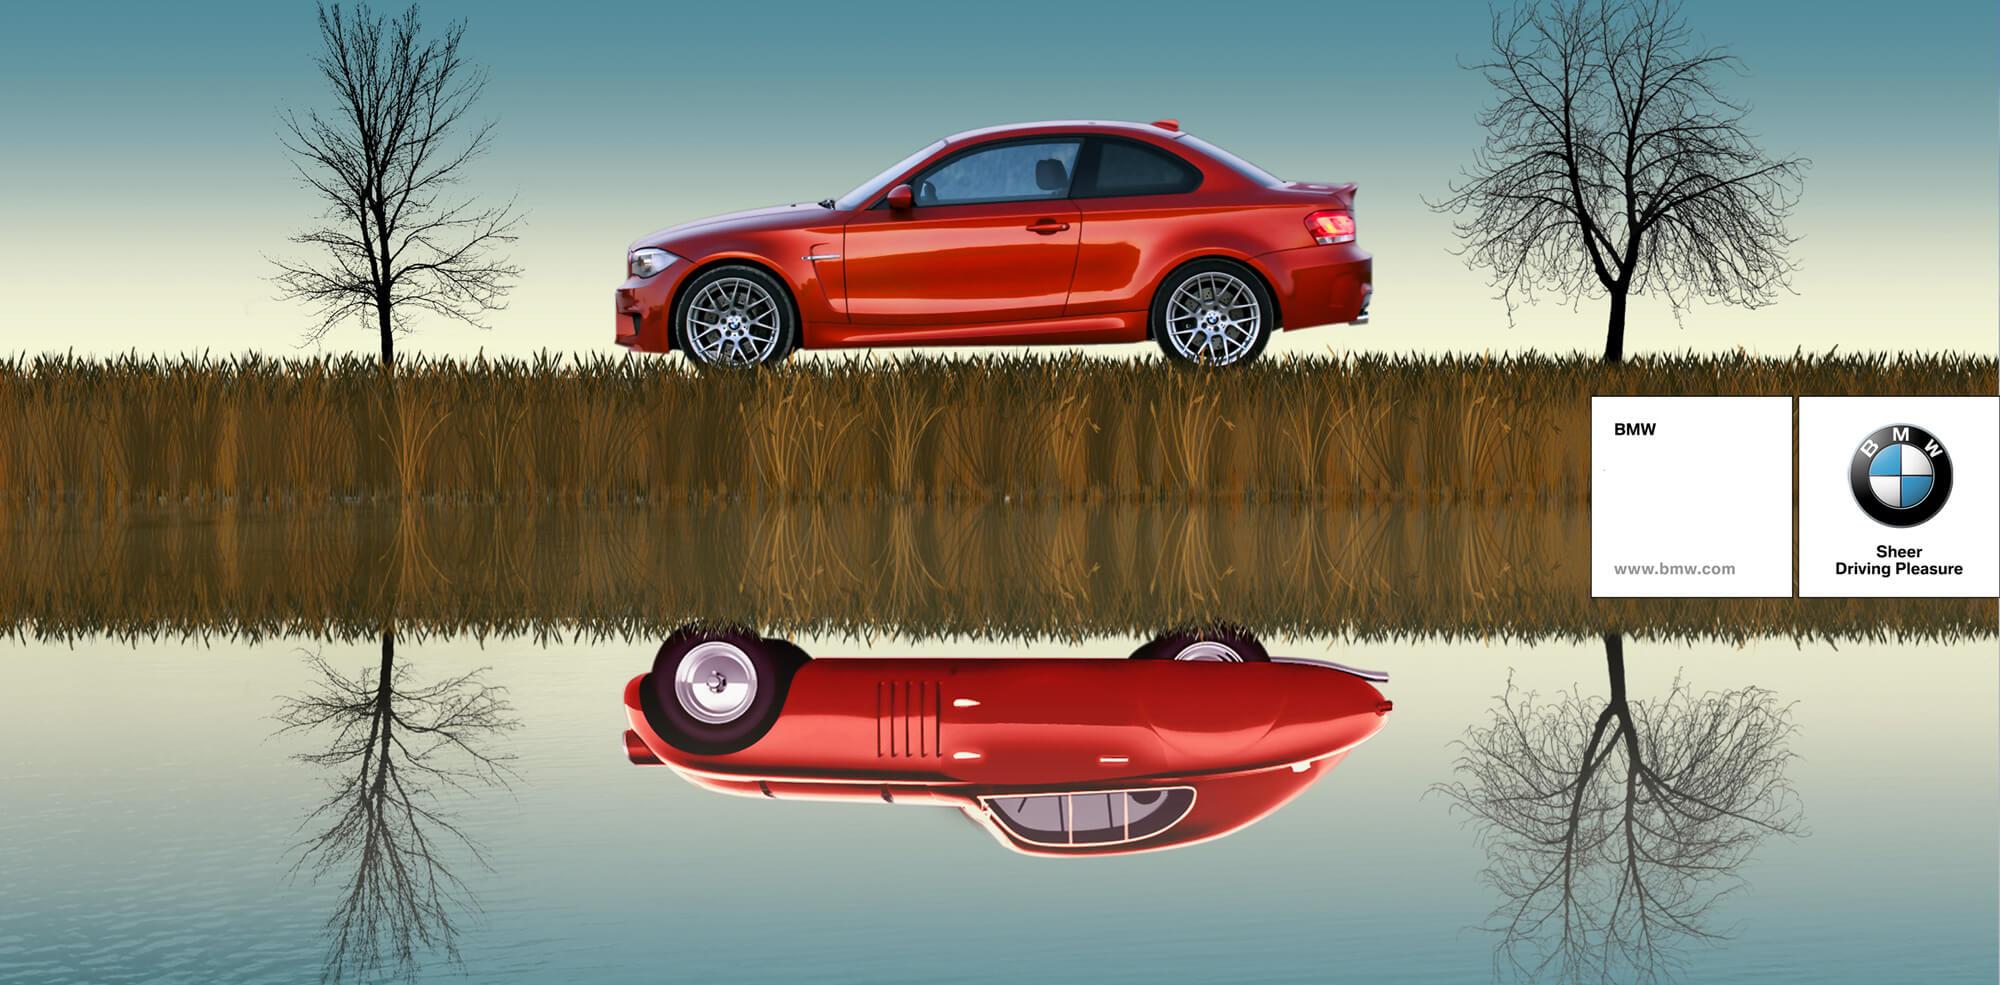 BMW_Print_Ads_2.jpg